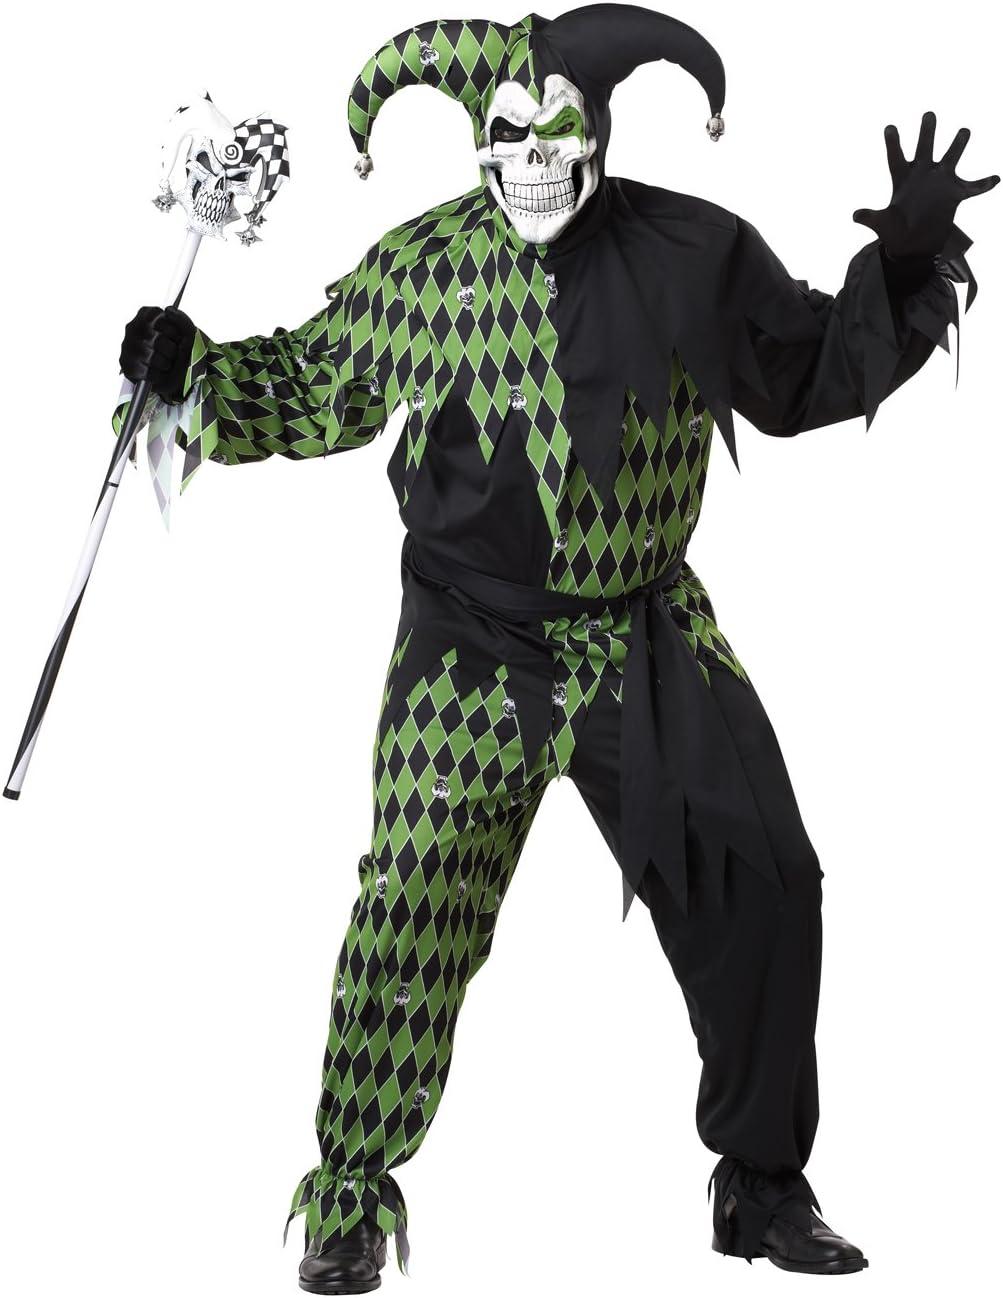 California Costumes - Disfraz De Bufón Malvado/Joker Verde Negro ...